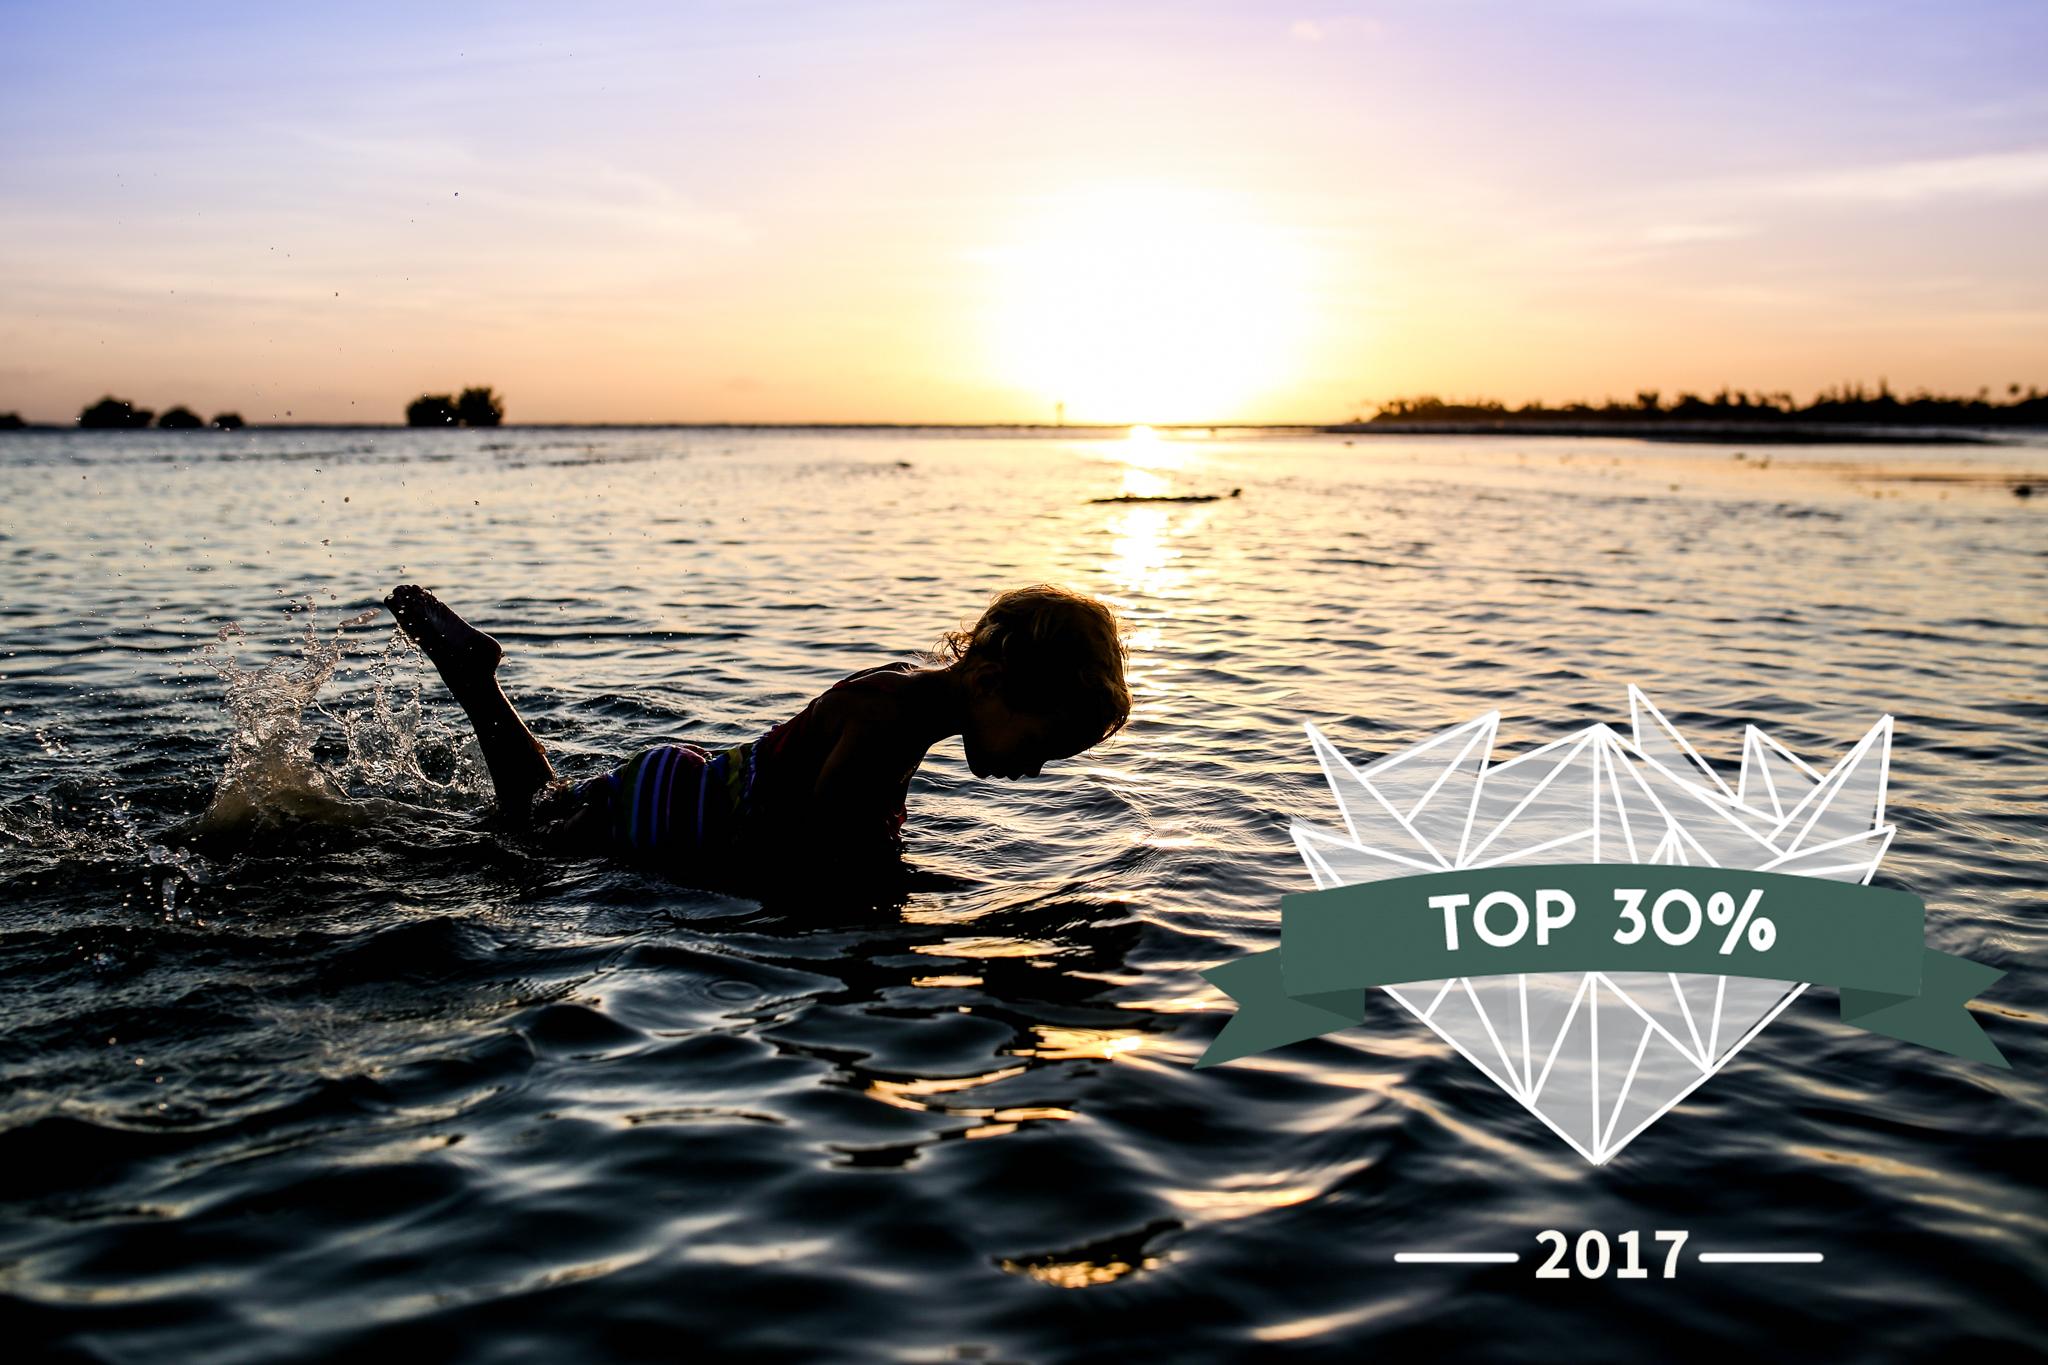 non watermarked 2017 shoot and share photo awards aloha sunshine photography 23November 11, 2015.jpg